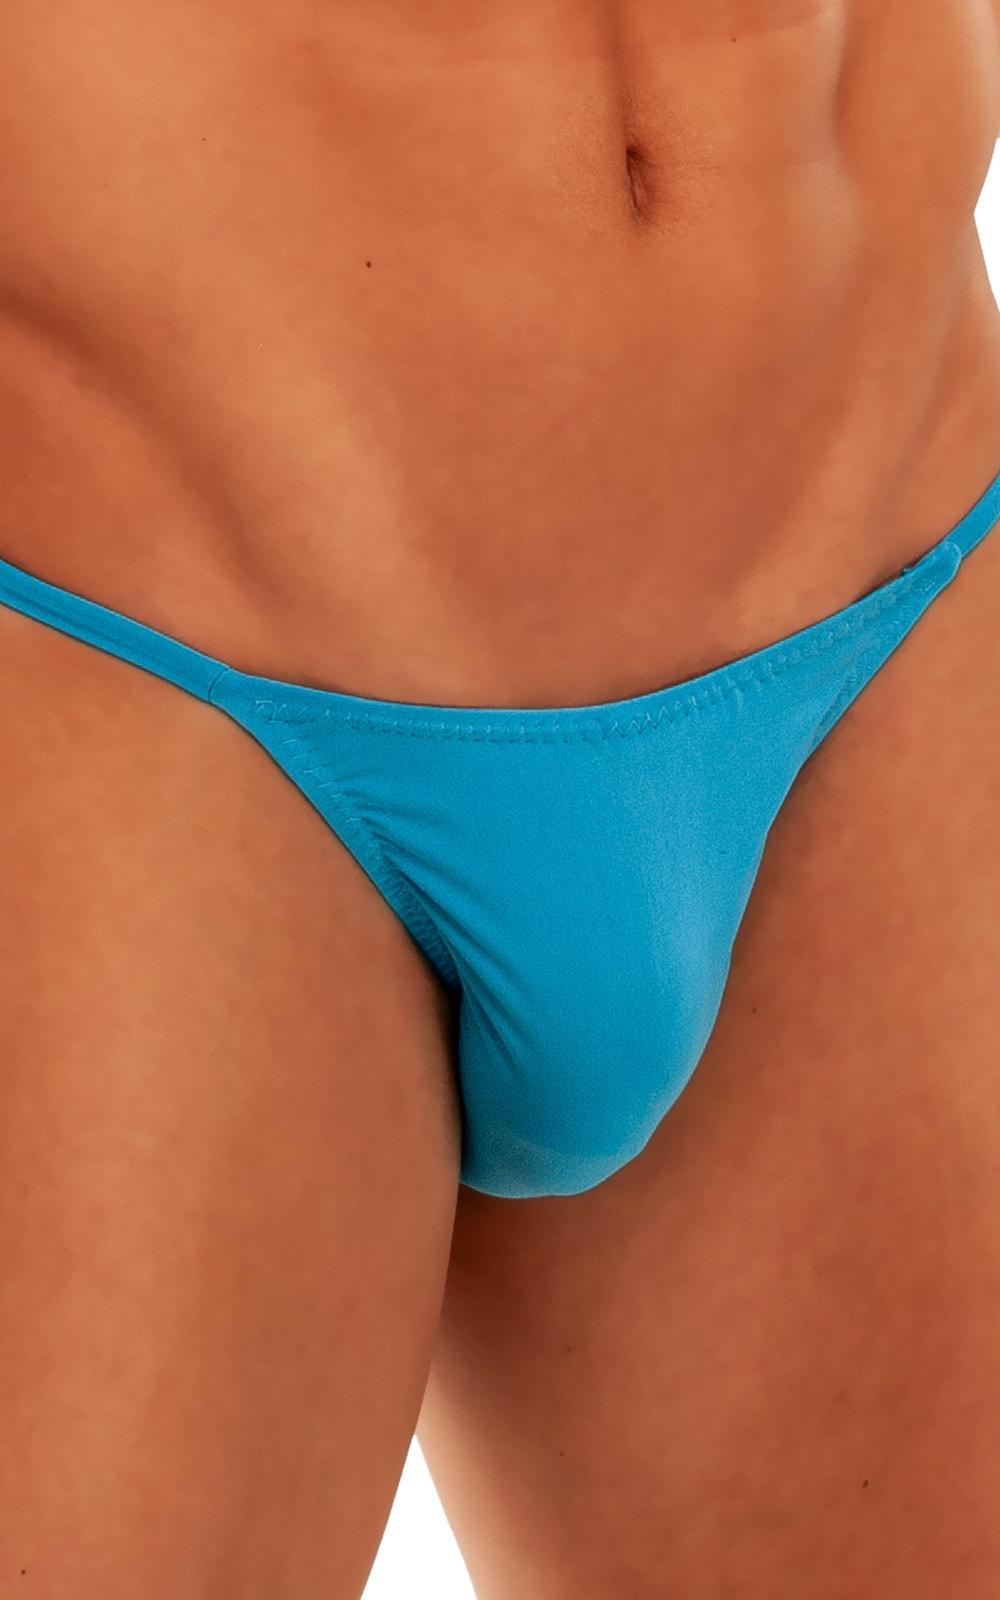 Super Low Brazilian Bikini in Semi Sheer ThinSkinz Sapphire 4